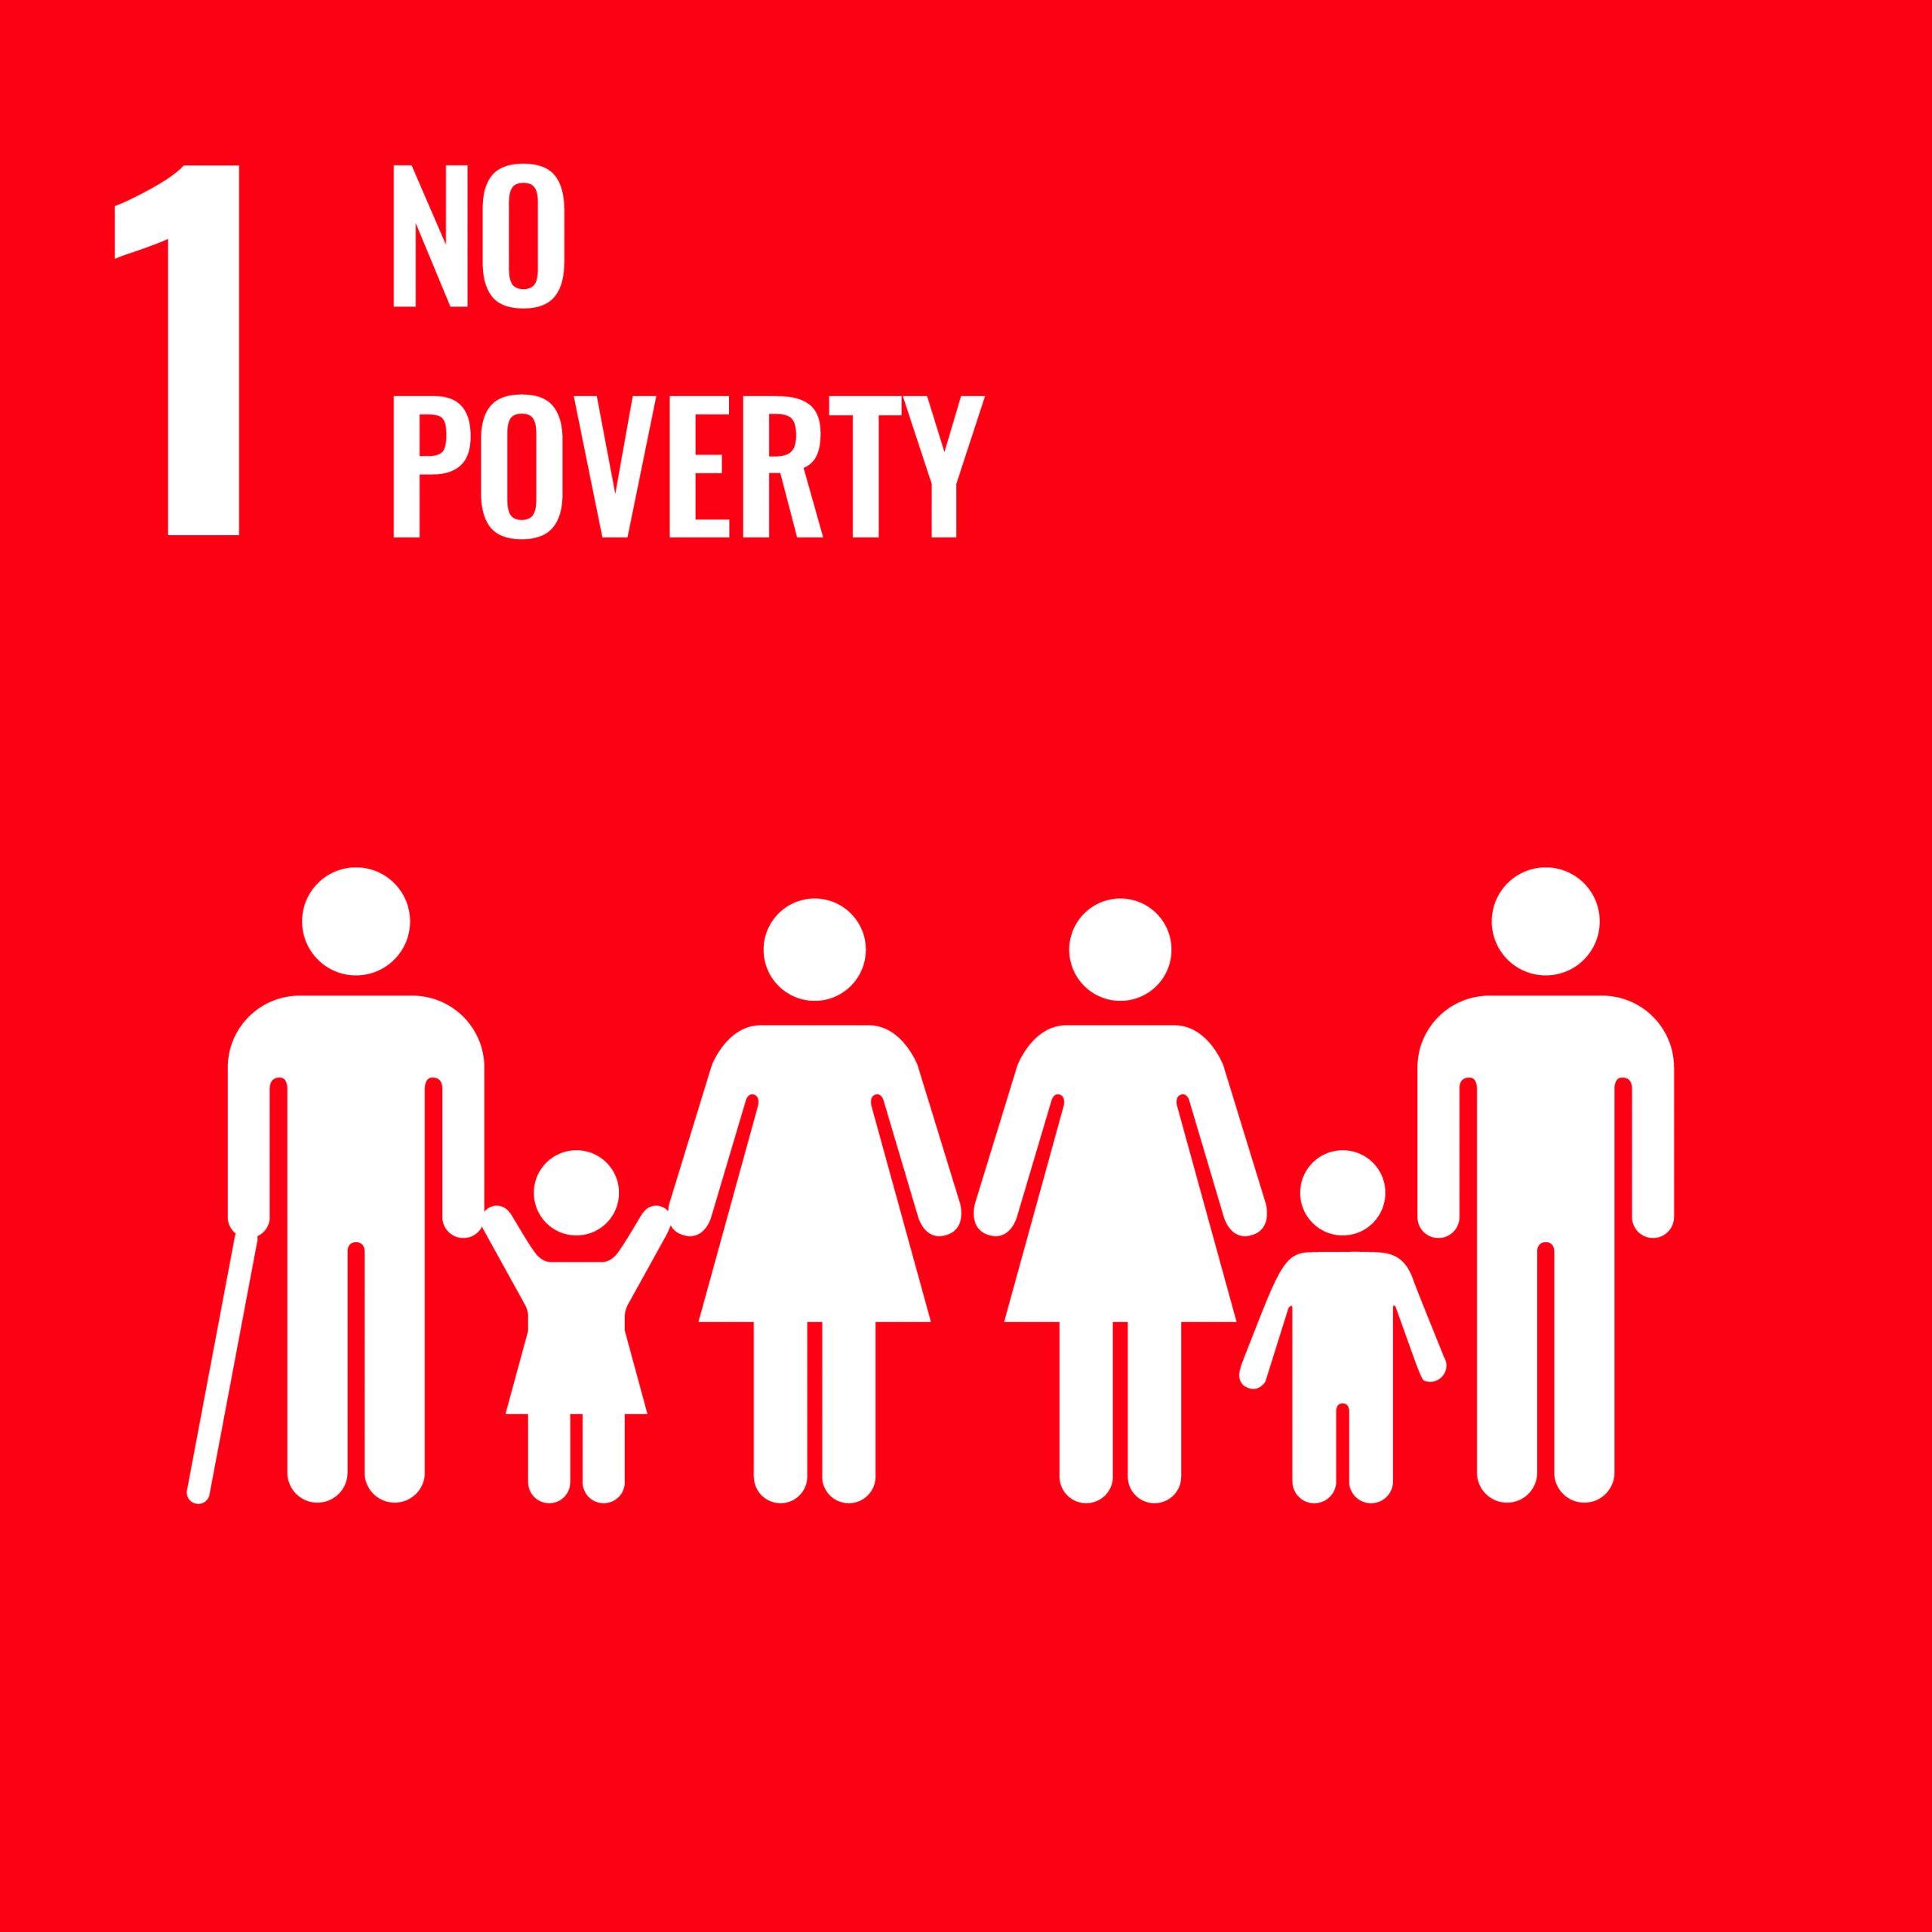 No Poverty SDG 1